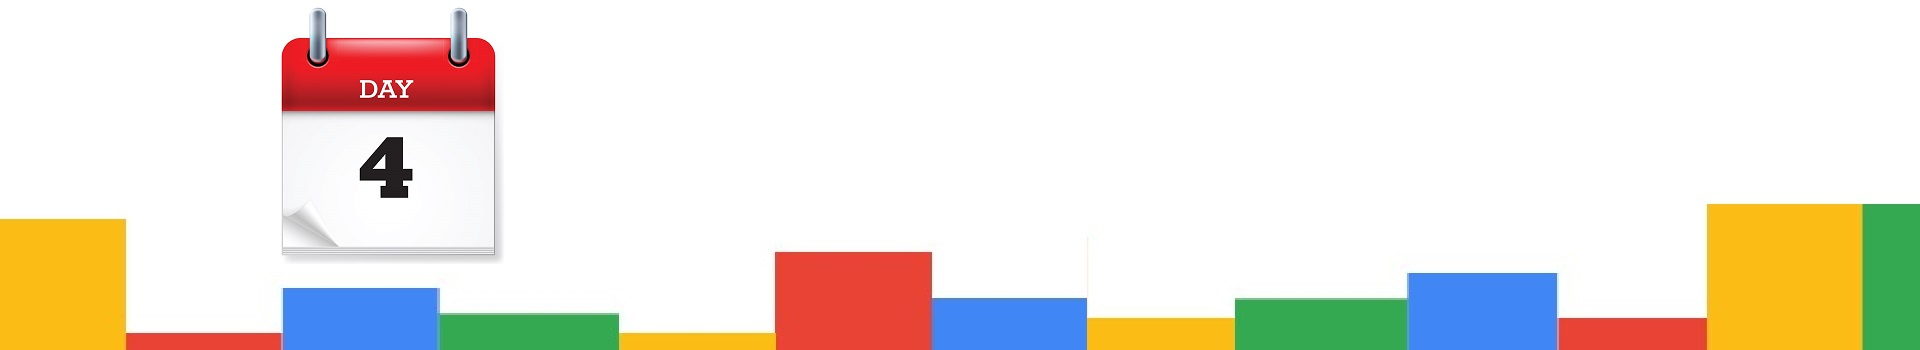 Google Day 4